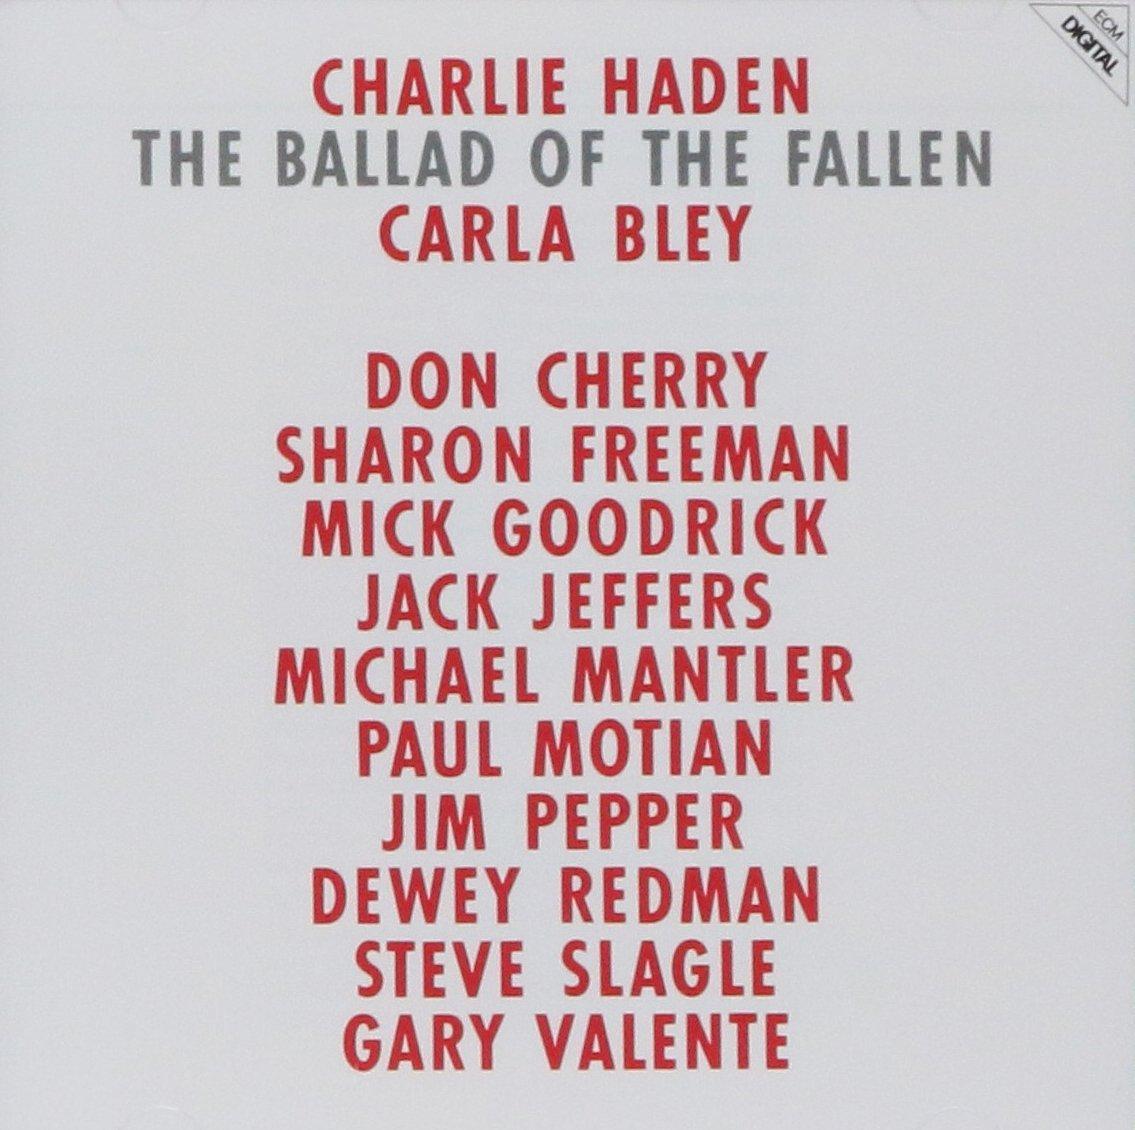 Charlie Haden. The Ballad Of The Fallen